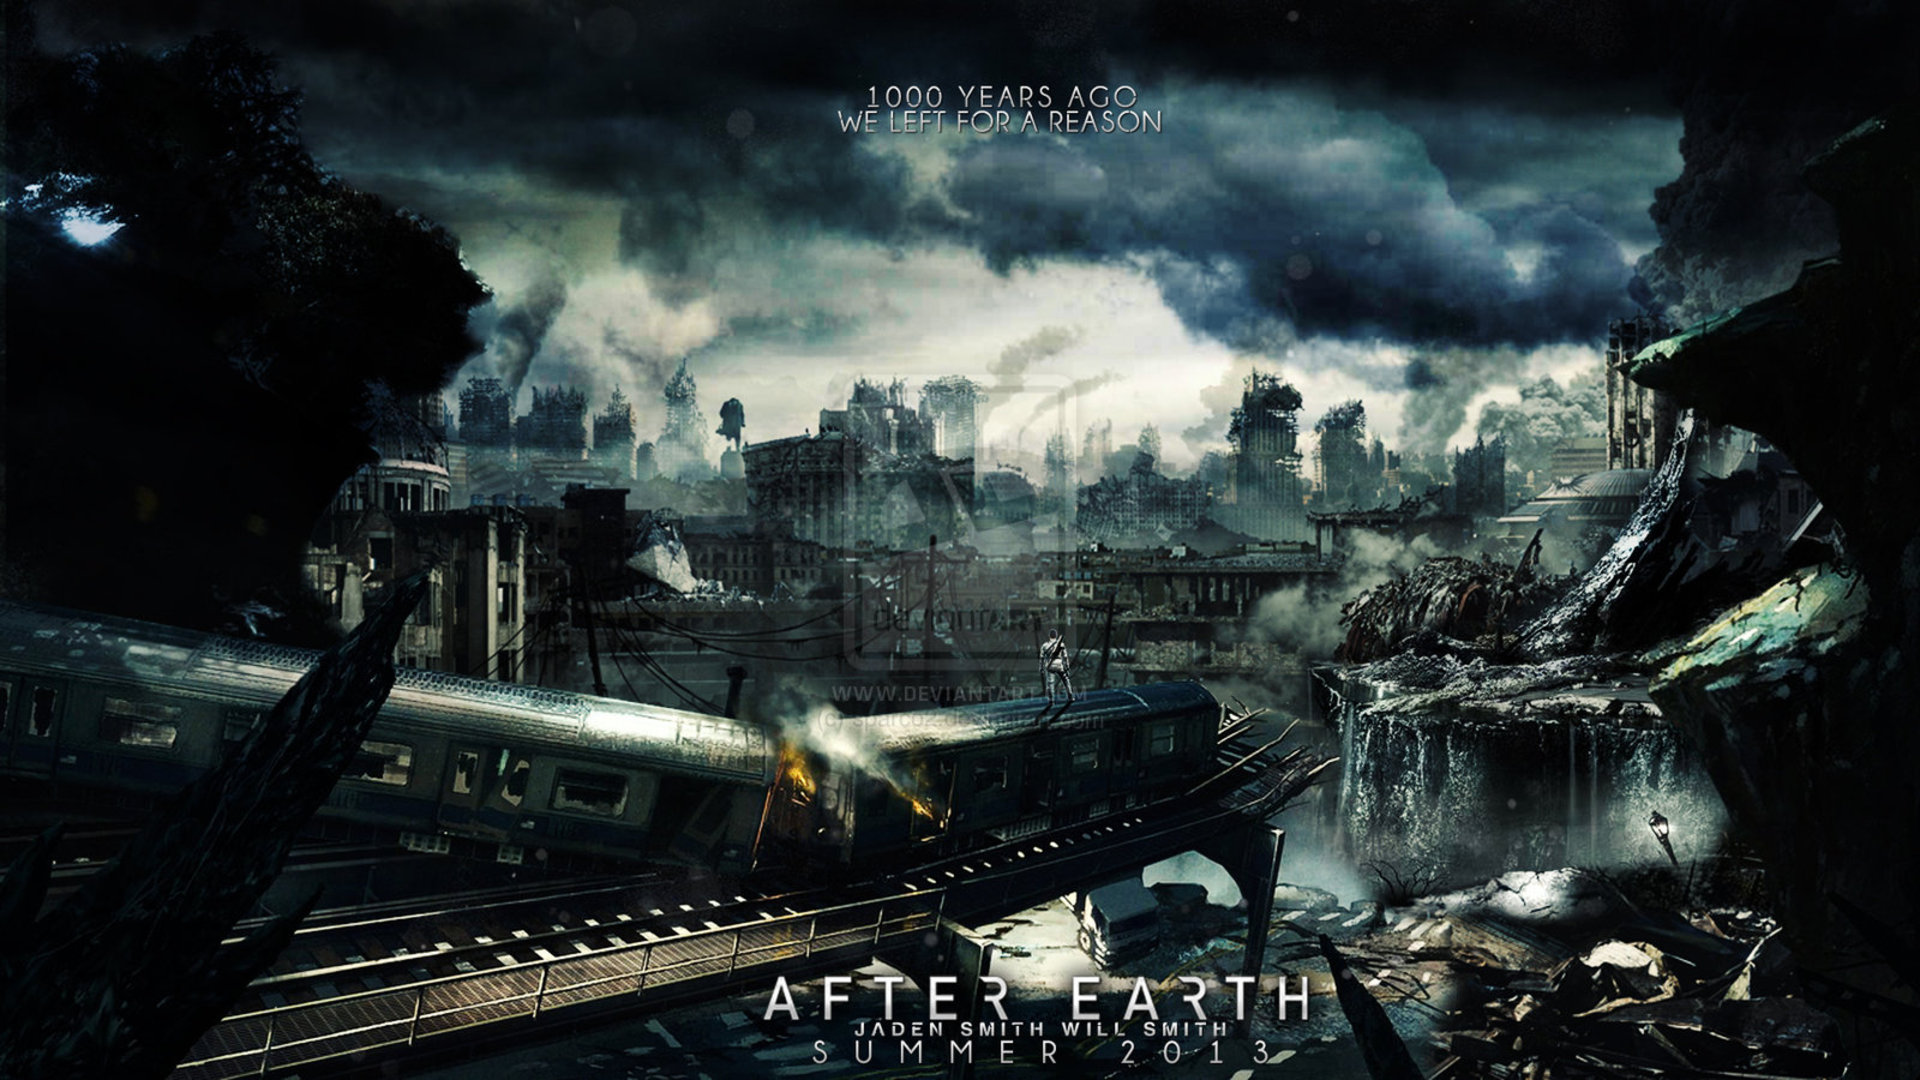 After Earth Movie 2013 Wallpapers HD 1920x1080 ImageBankbiz 1920x1080